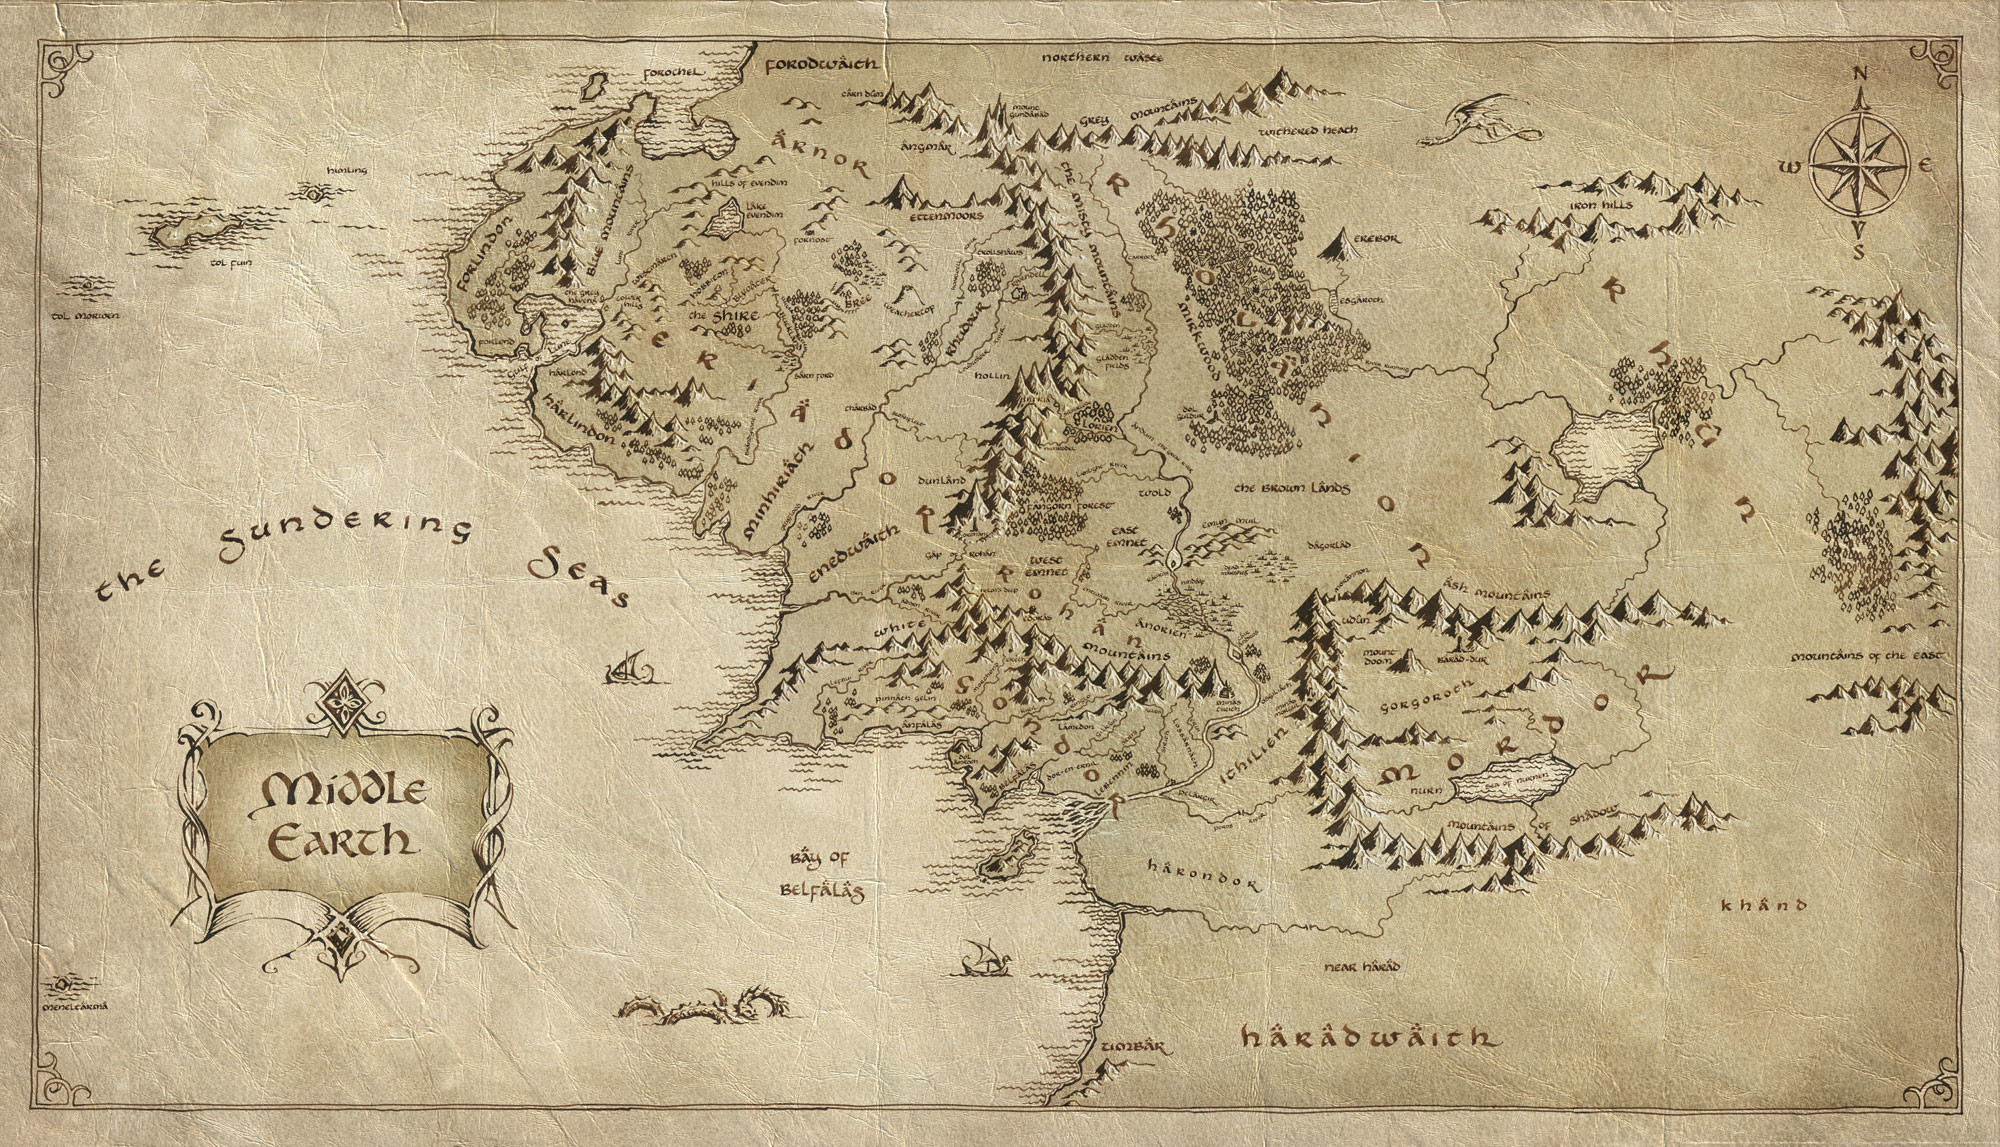 … Tolkien-esque style.